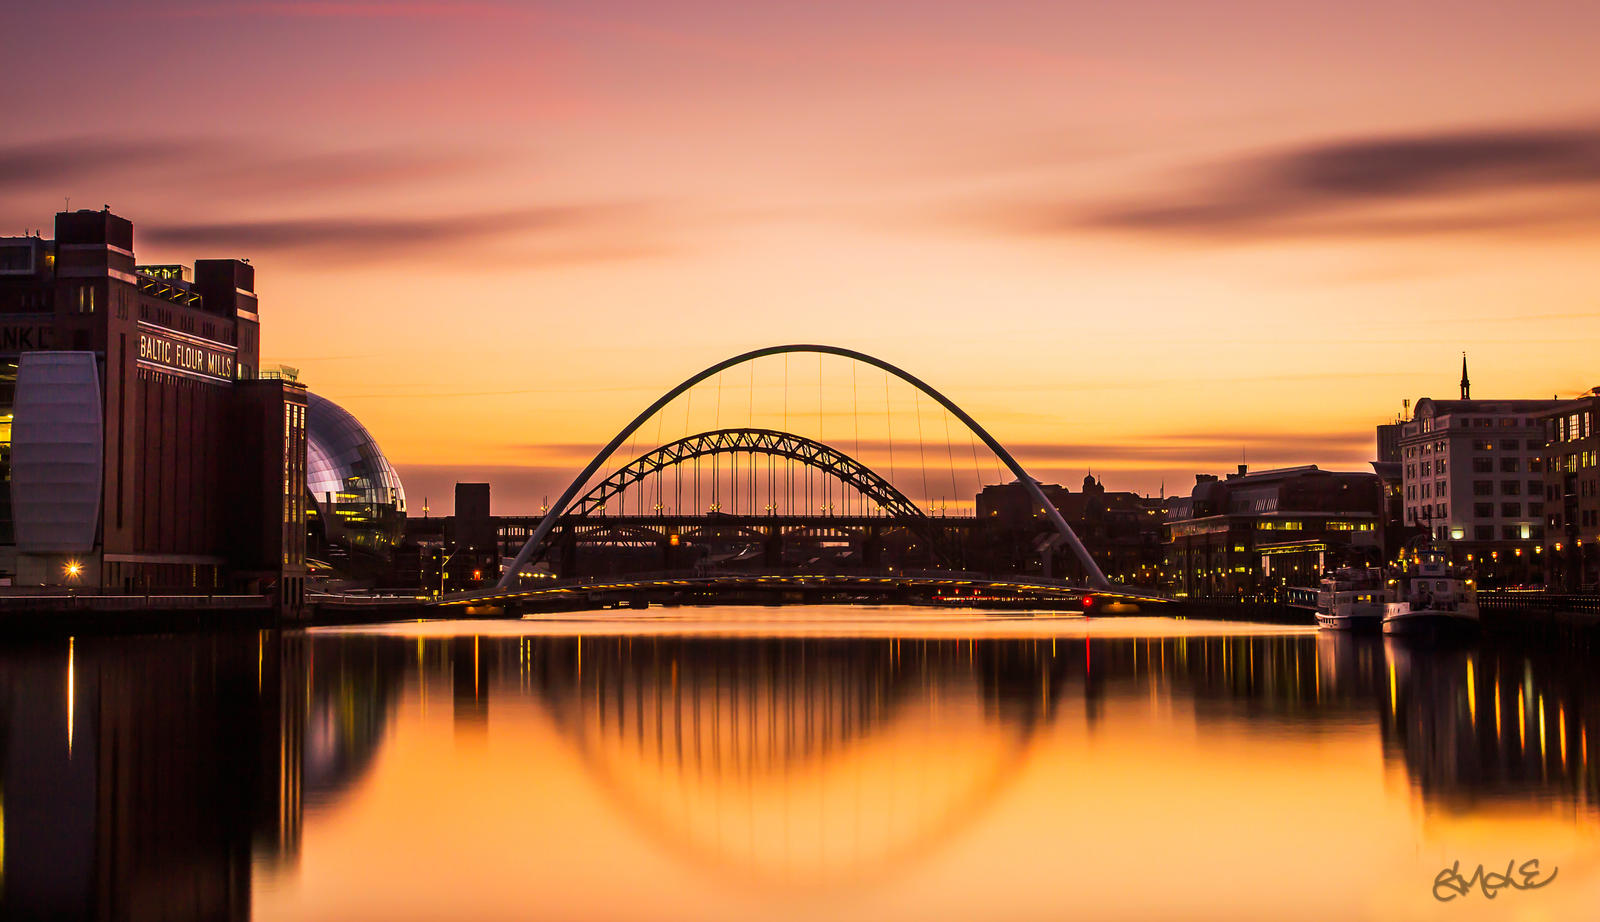 Tyne Bridge Sunset by rephocus